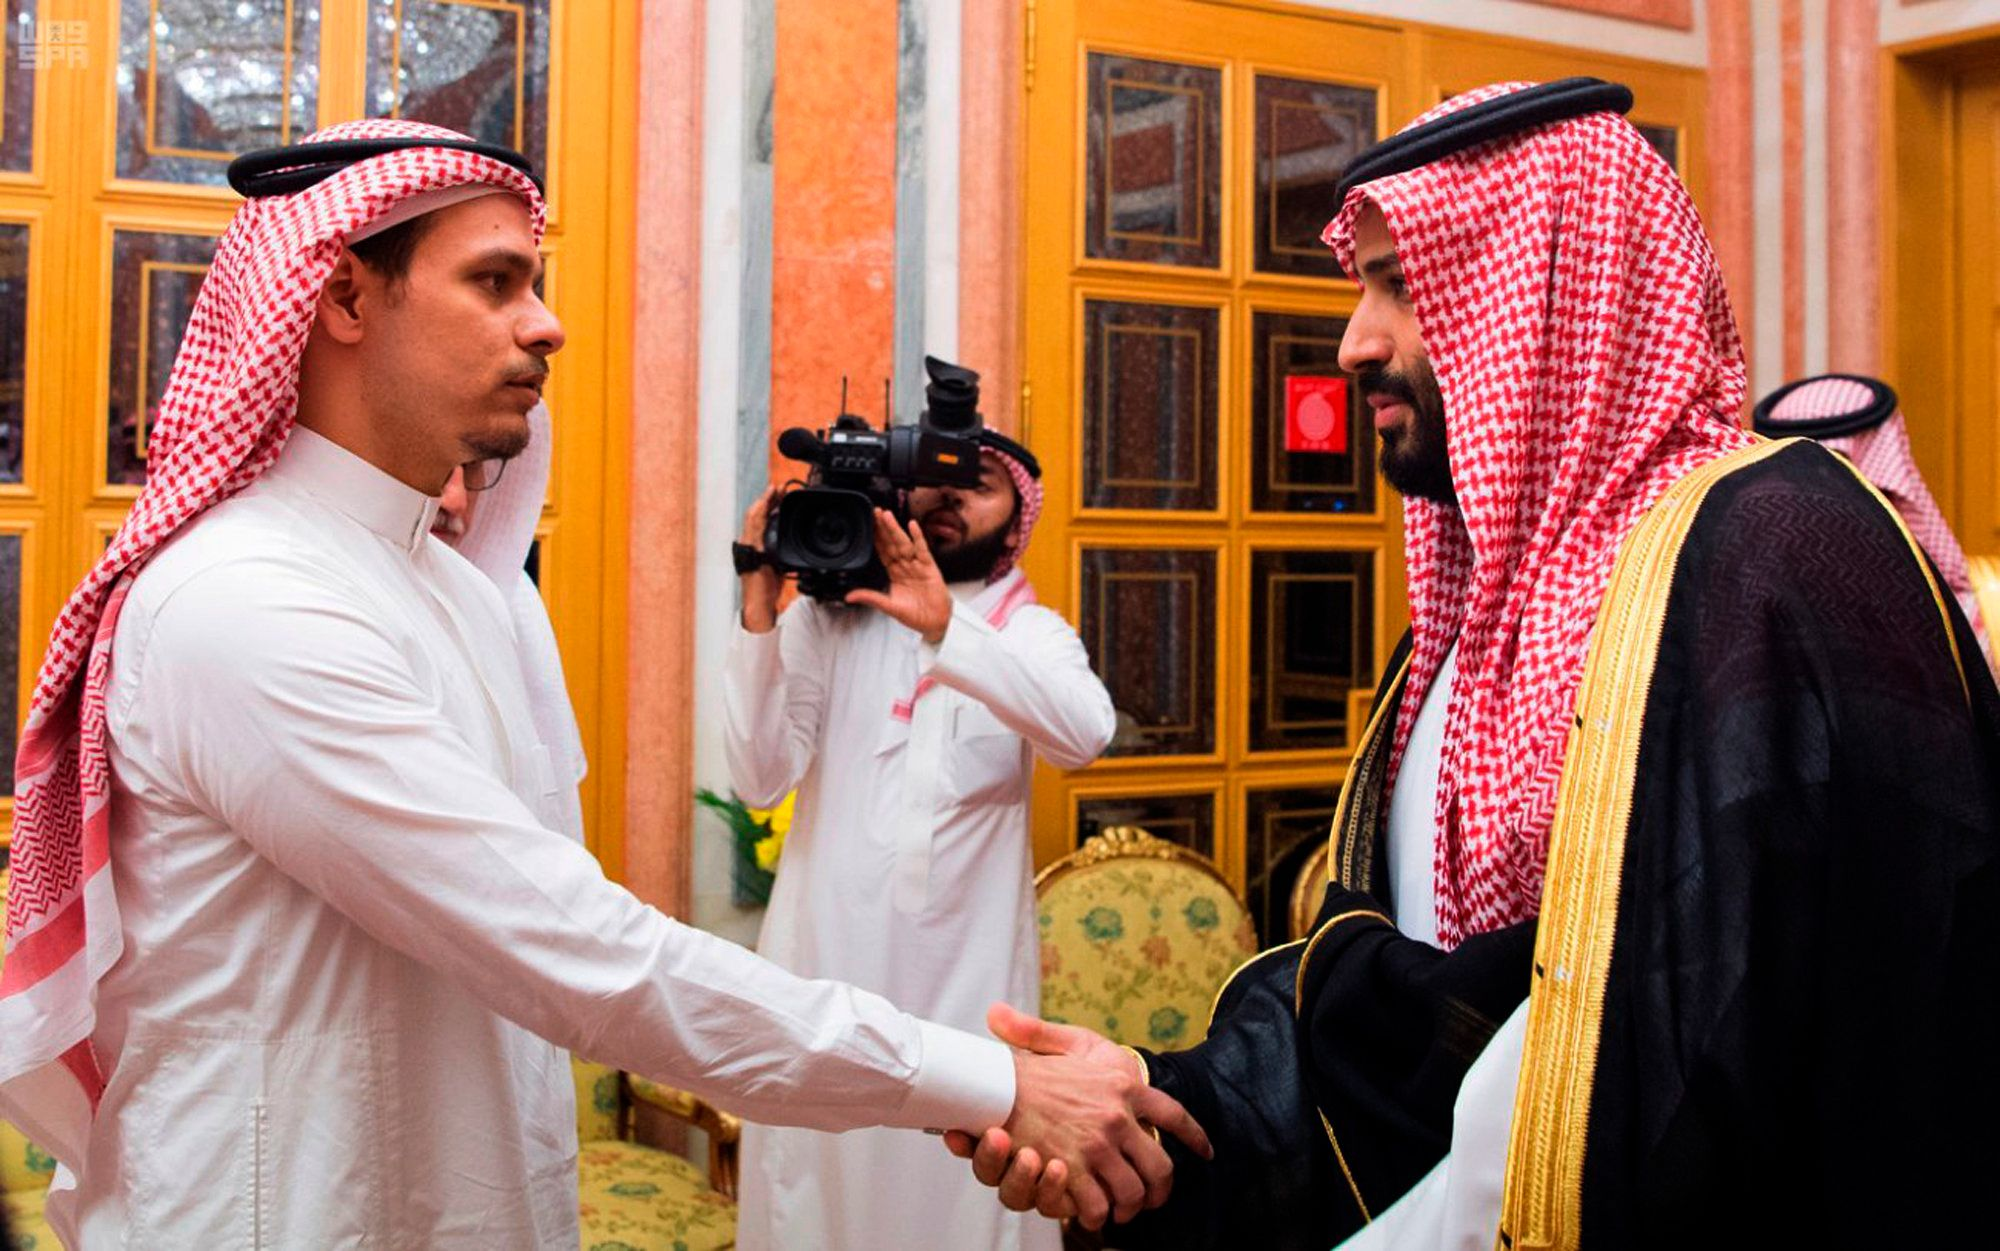 Jamal Khashoggi's Son Meets Saudi King And Crown Prince In Disgraceful Photo